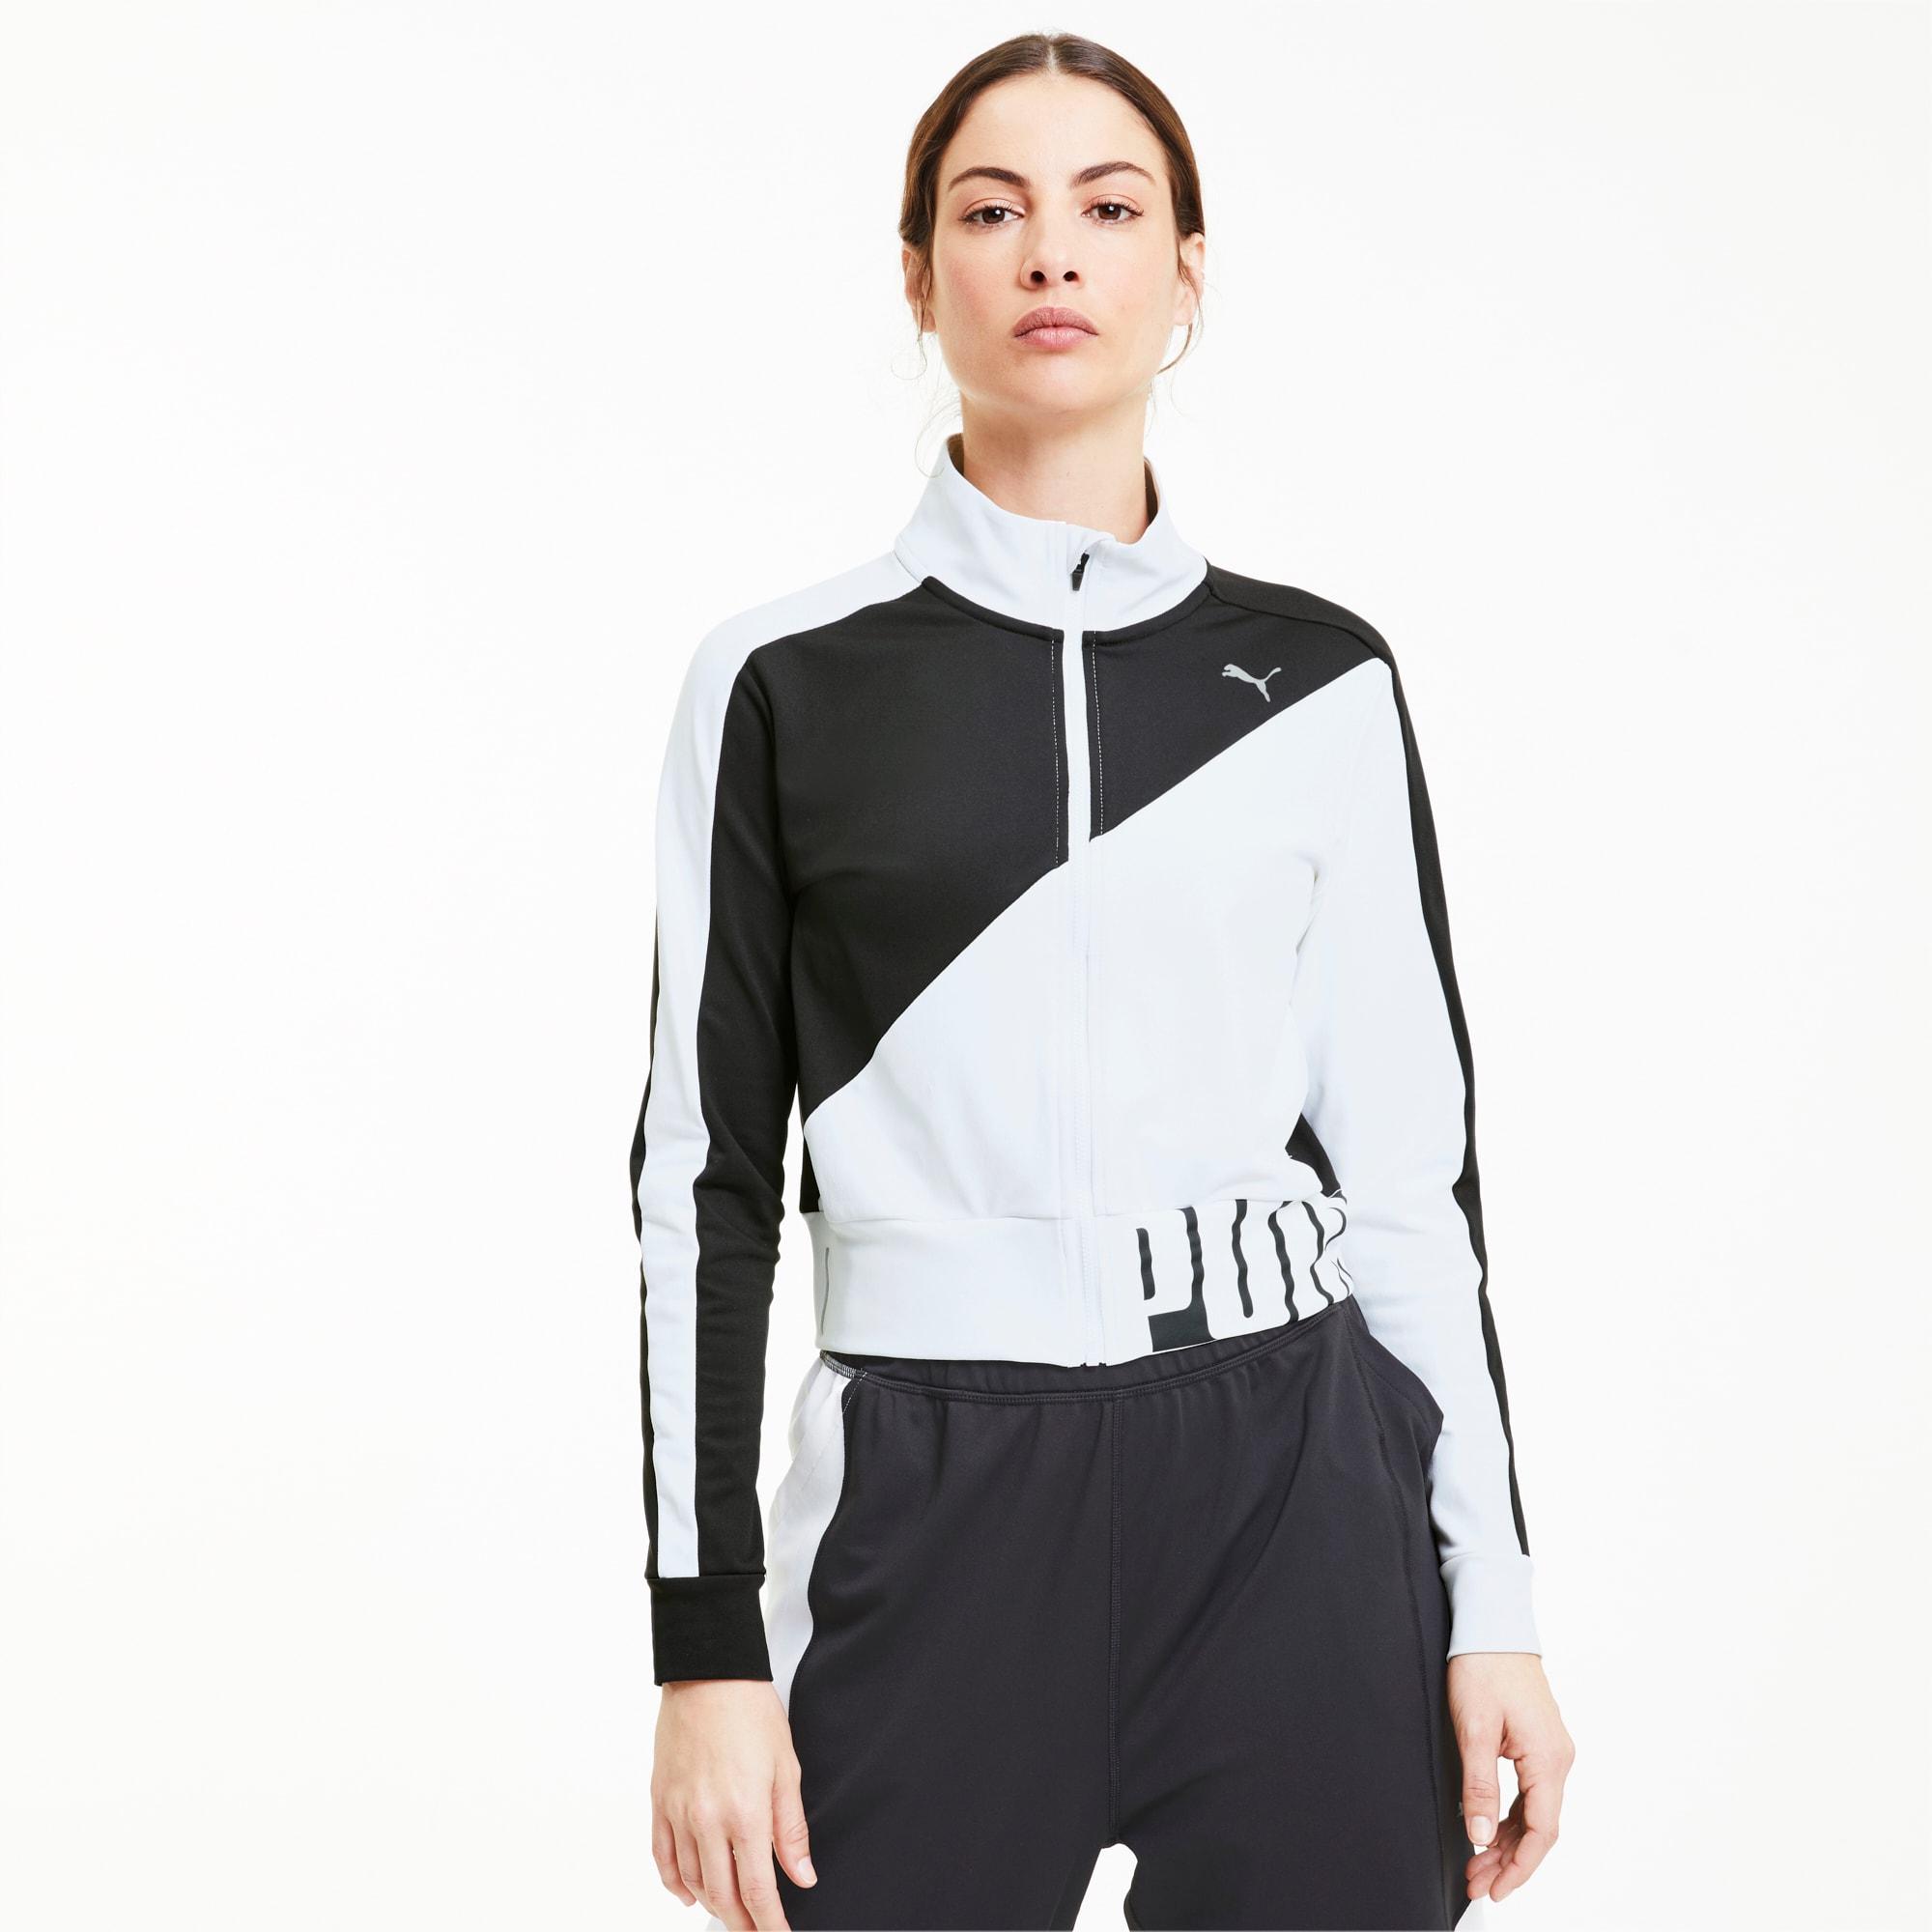 puma Stretch Knit trainingsjack voor Dames, Wit/ZwartL